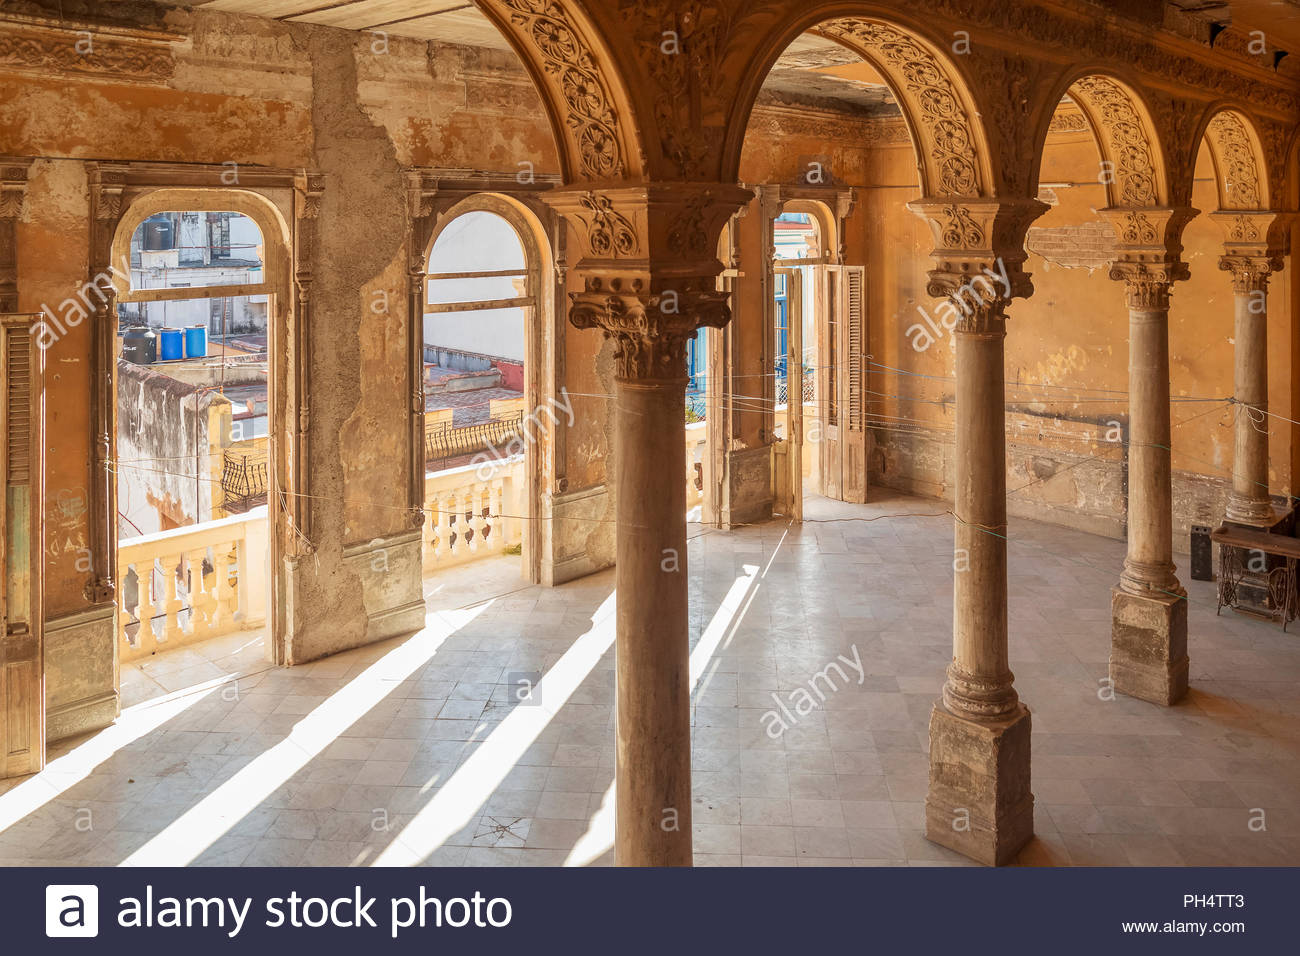 Colonnade in La Guarida Paladar in Havana - Stock Image